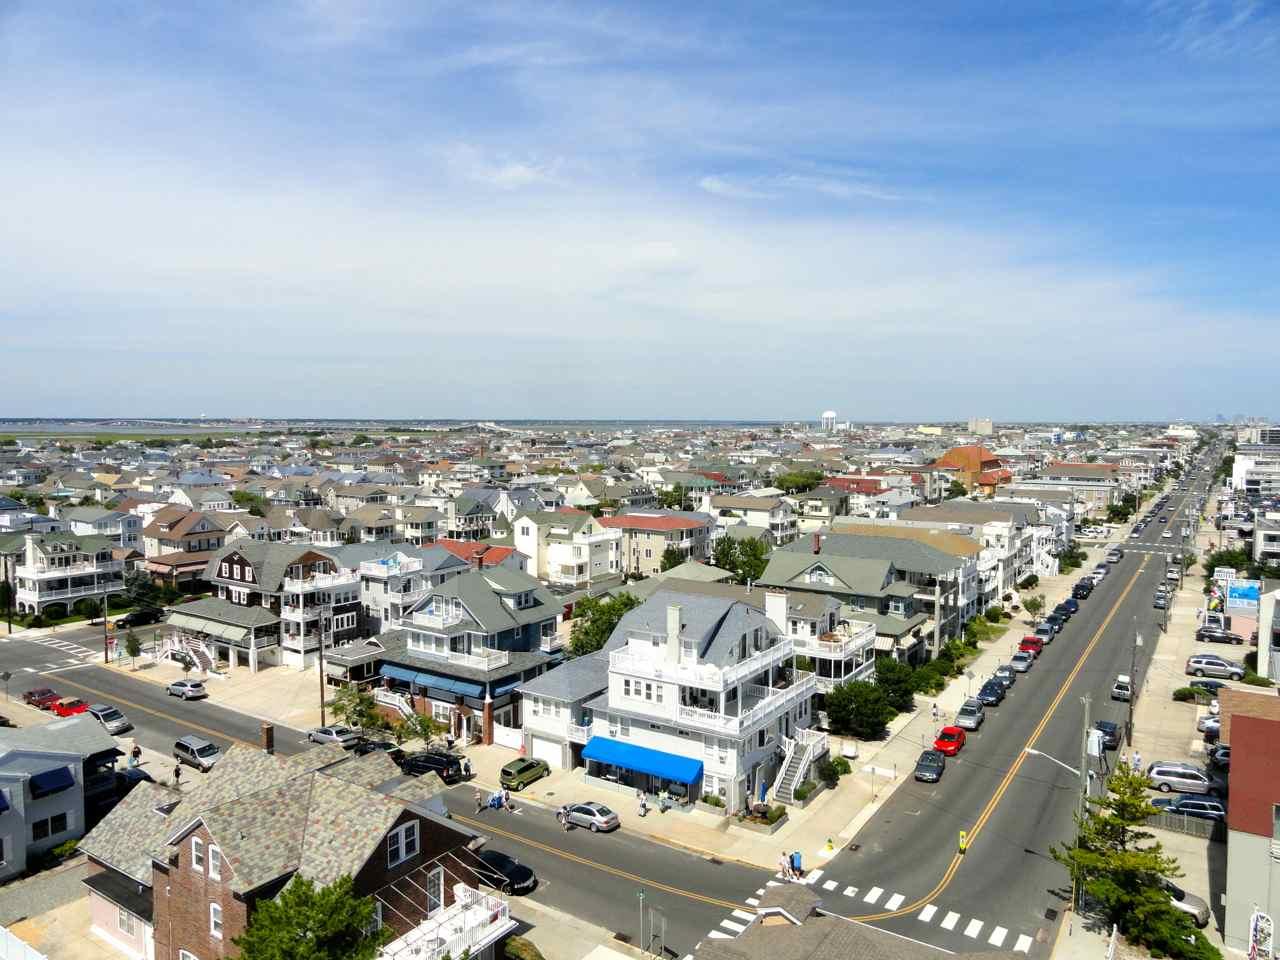 Ocean city s 11 3 billion in total real estate value back for Ocean city nj surf fishing report